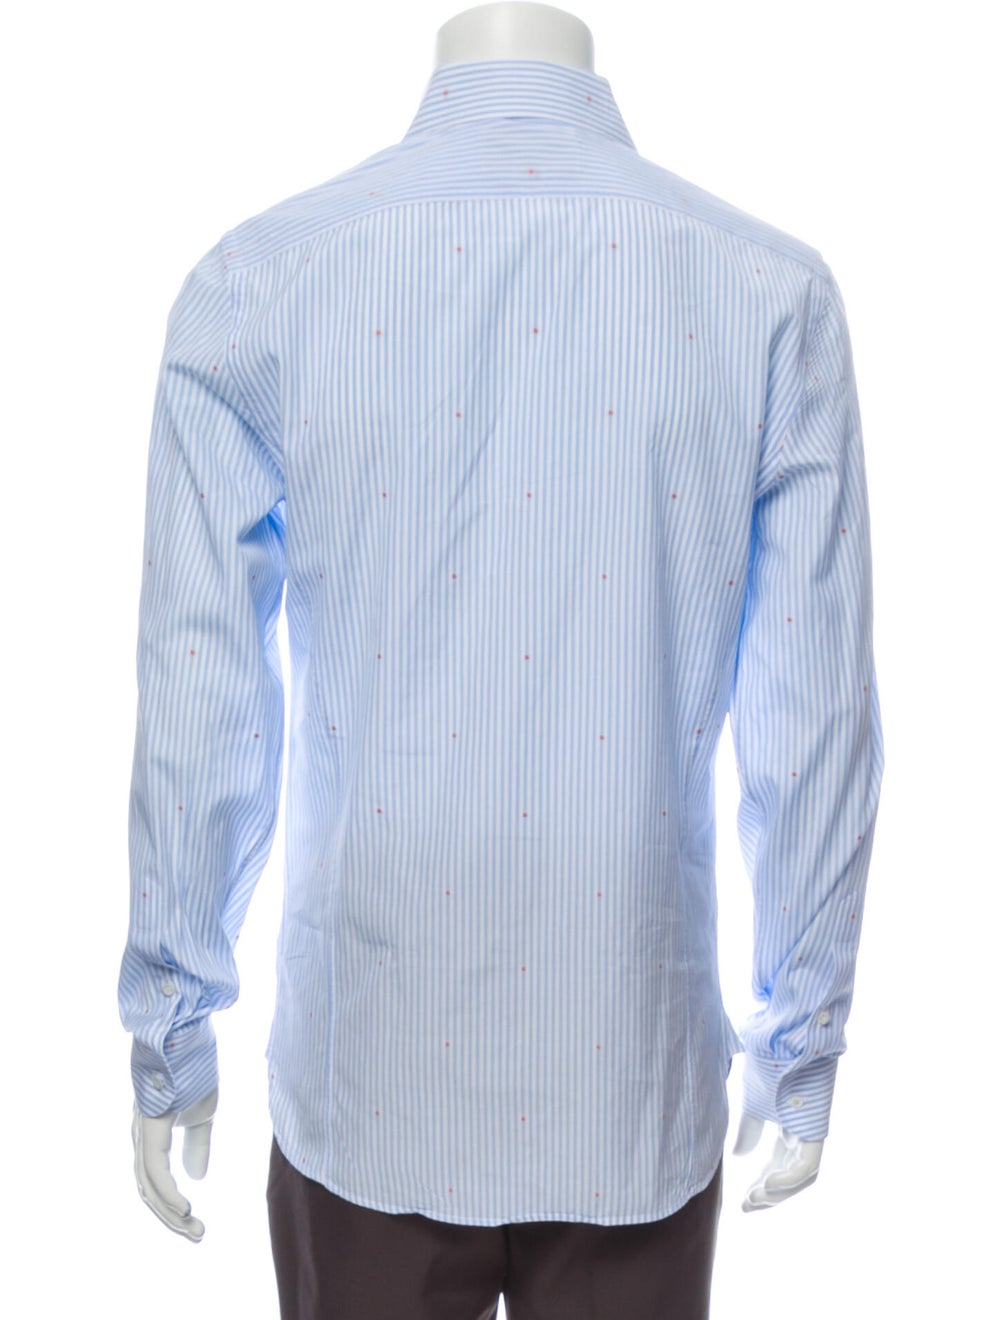 Gucci 2018 Striped Shirt Blue - image 3